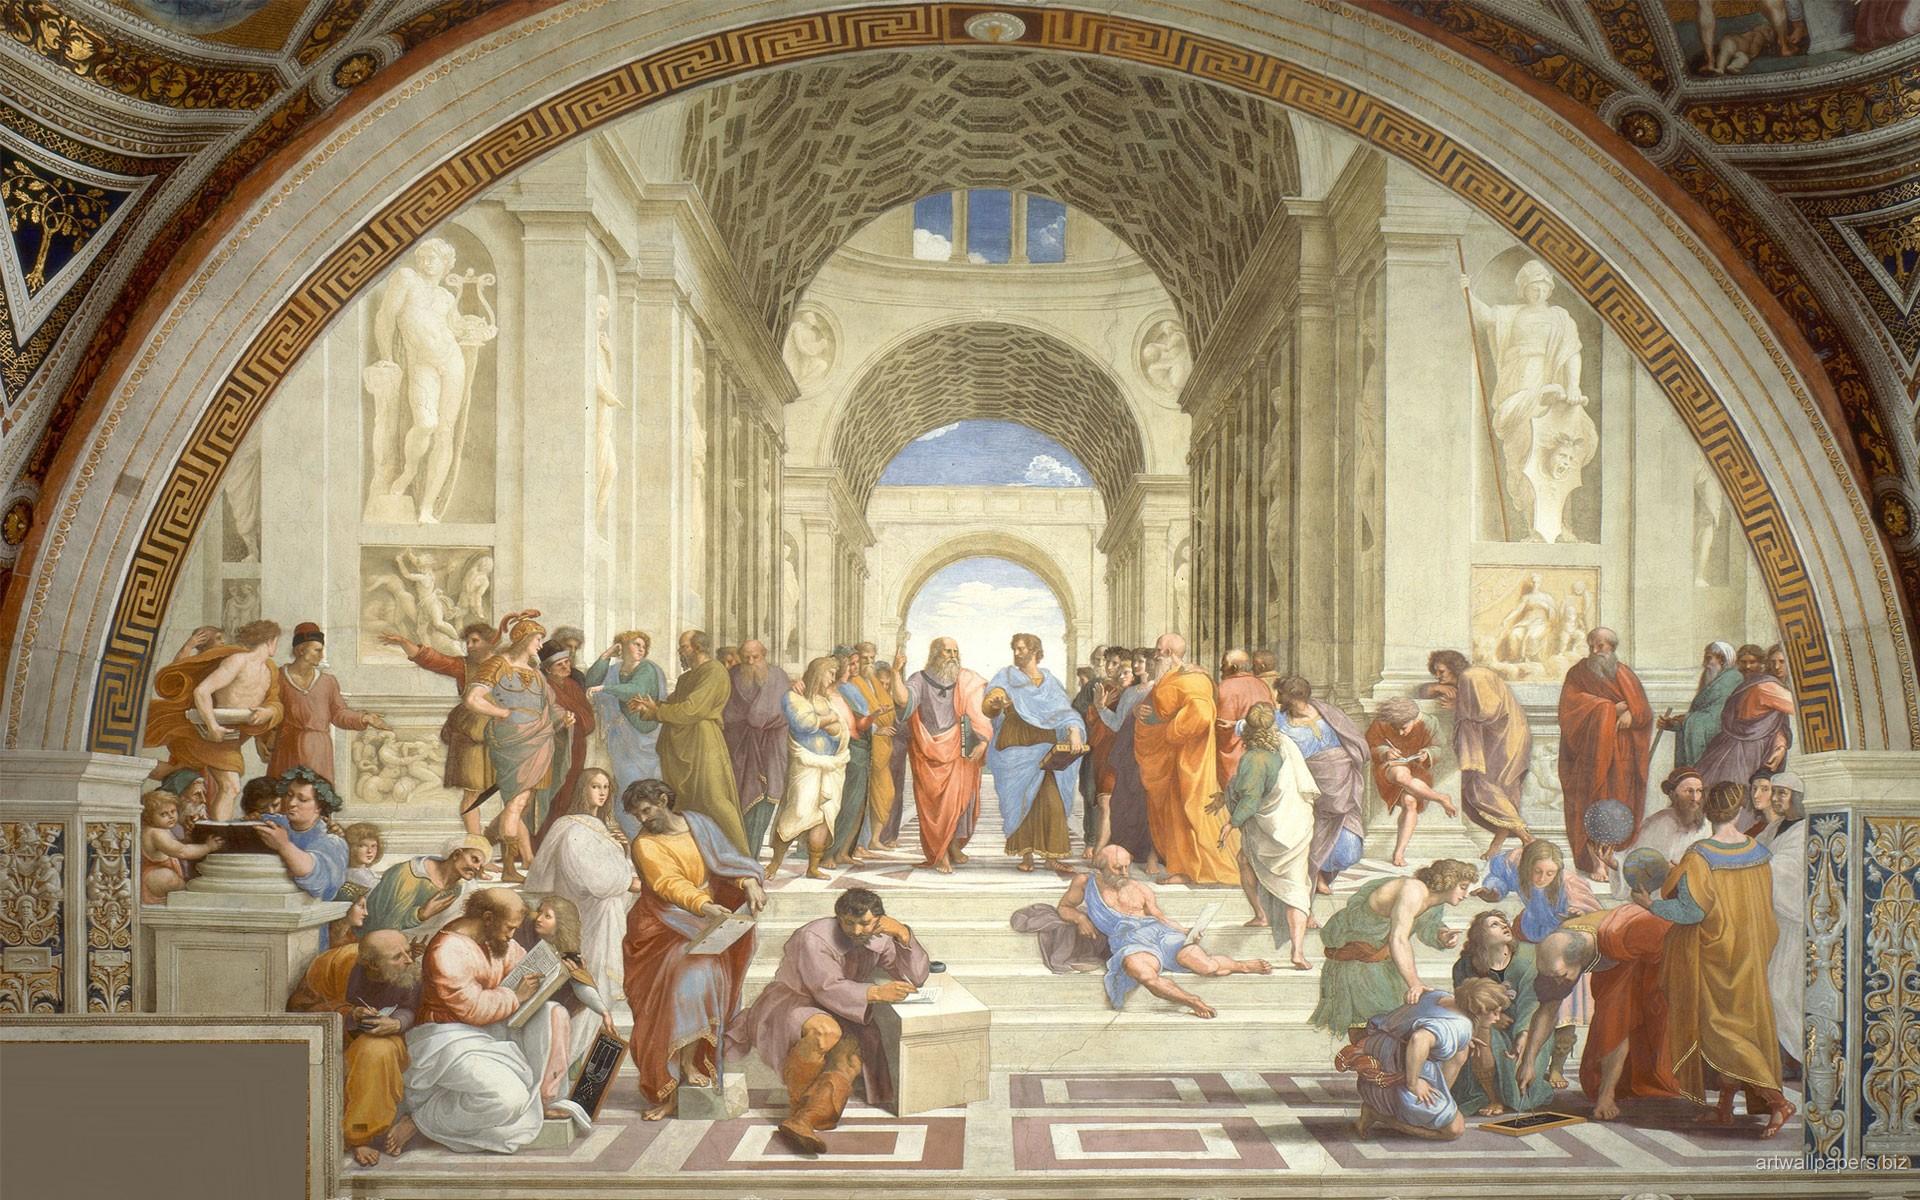 General 1920x1200 Raphael Athens philosophy arch school architecture painting students steps classic art Socrates Greek philosophers plato